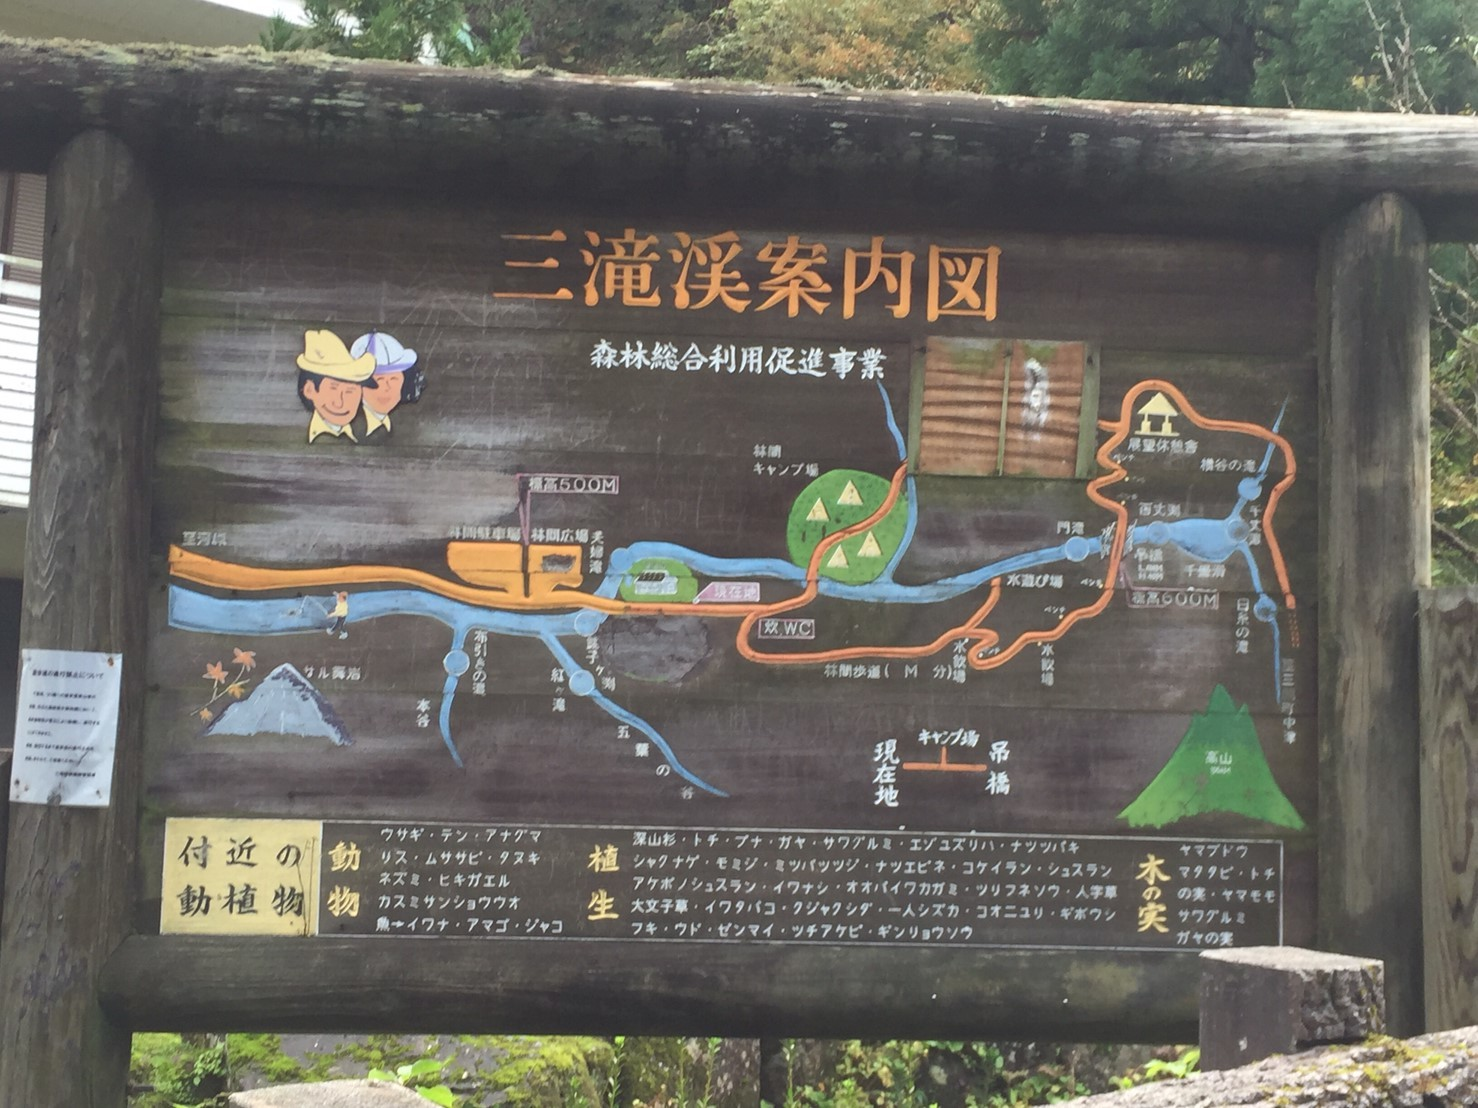 西郷工芸祭り・三滝渓_e0115904_17052217.jpg